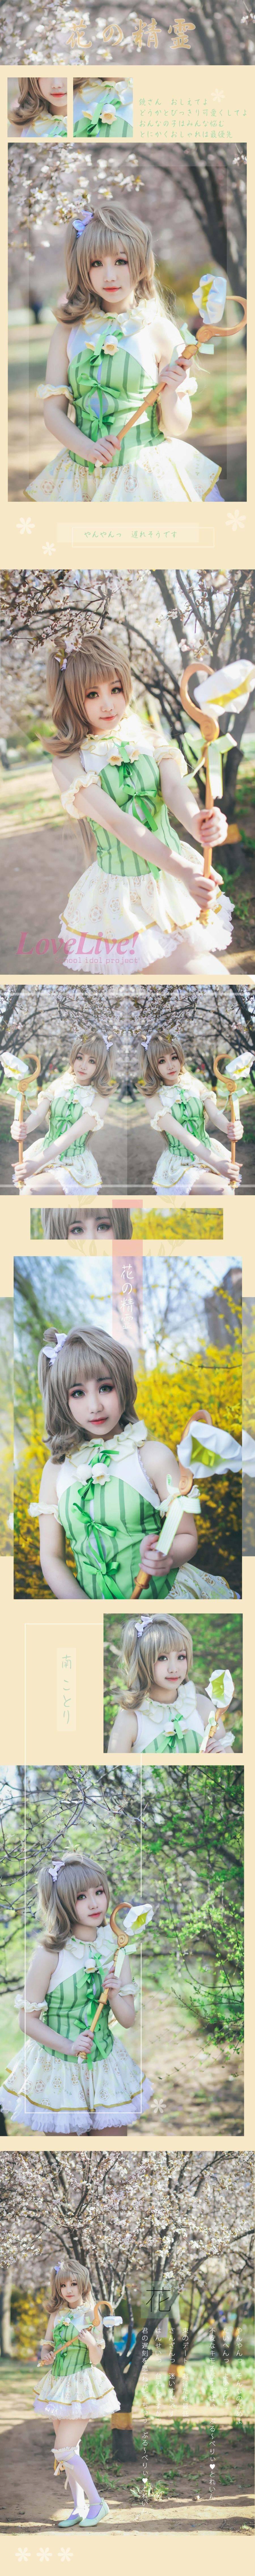 cosplay:南小鸟@雅雅芝士奶盖茶